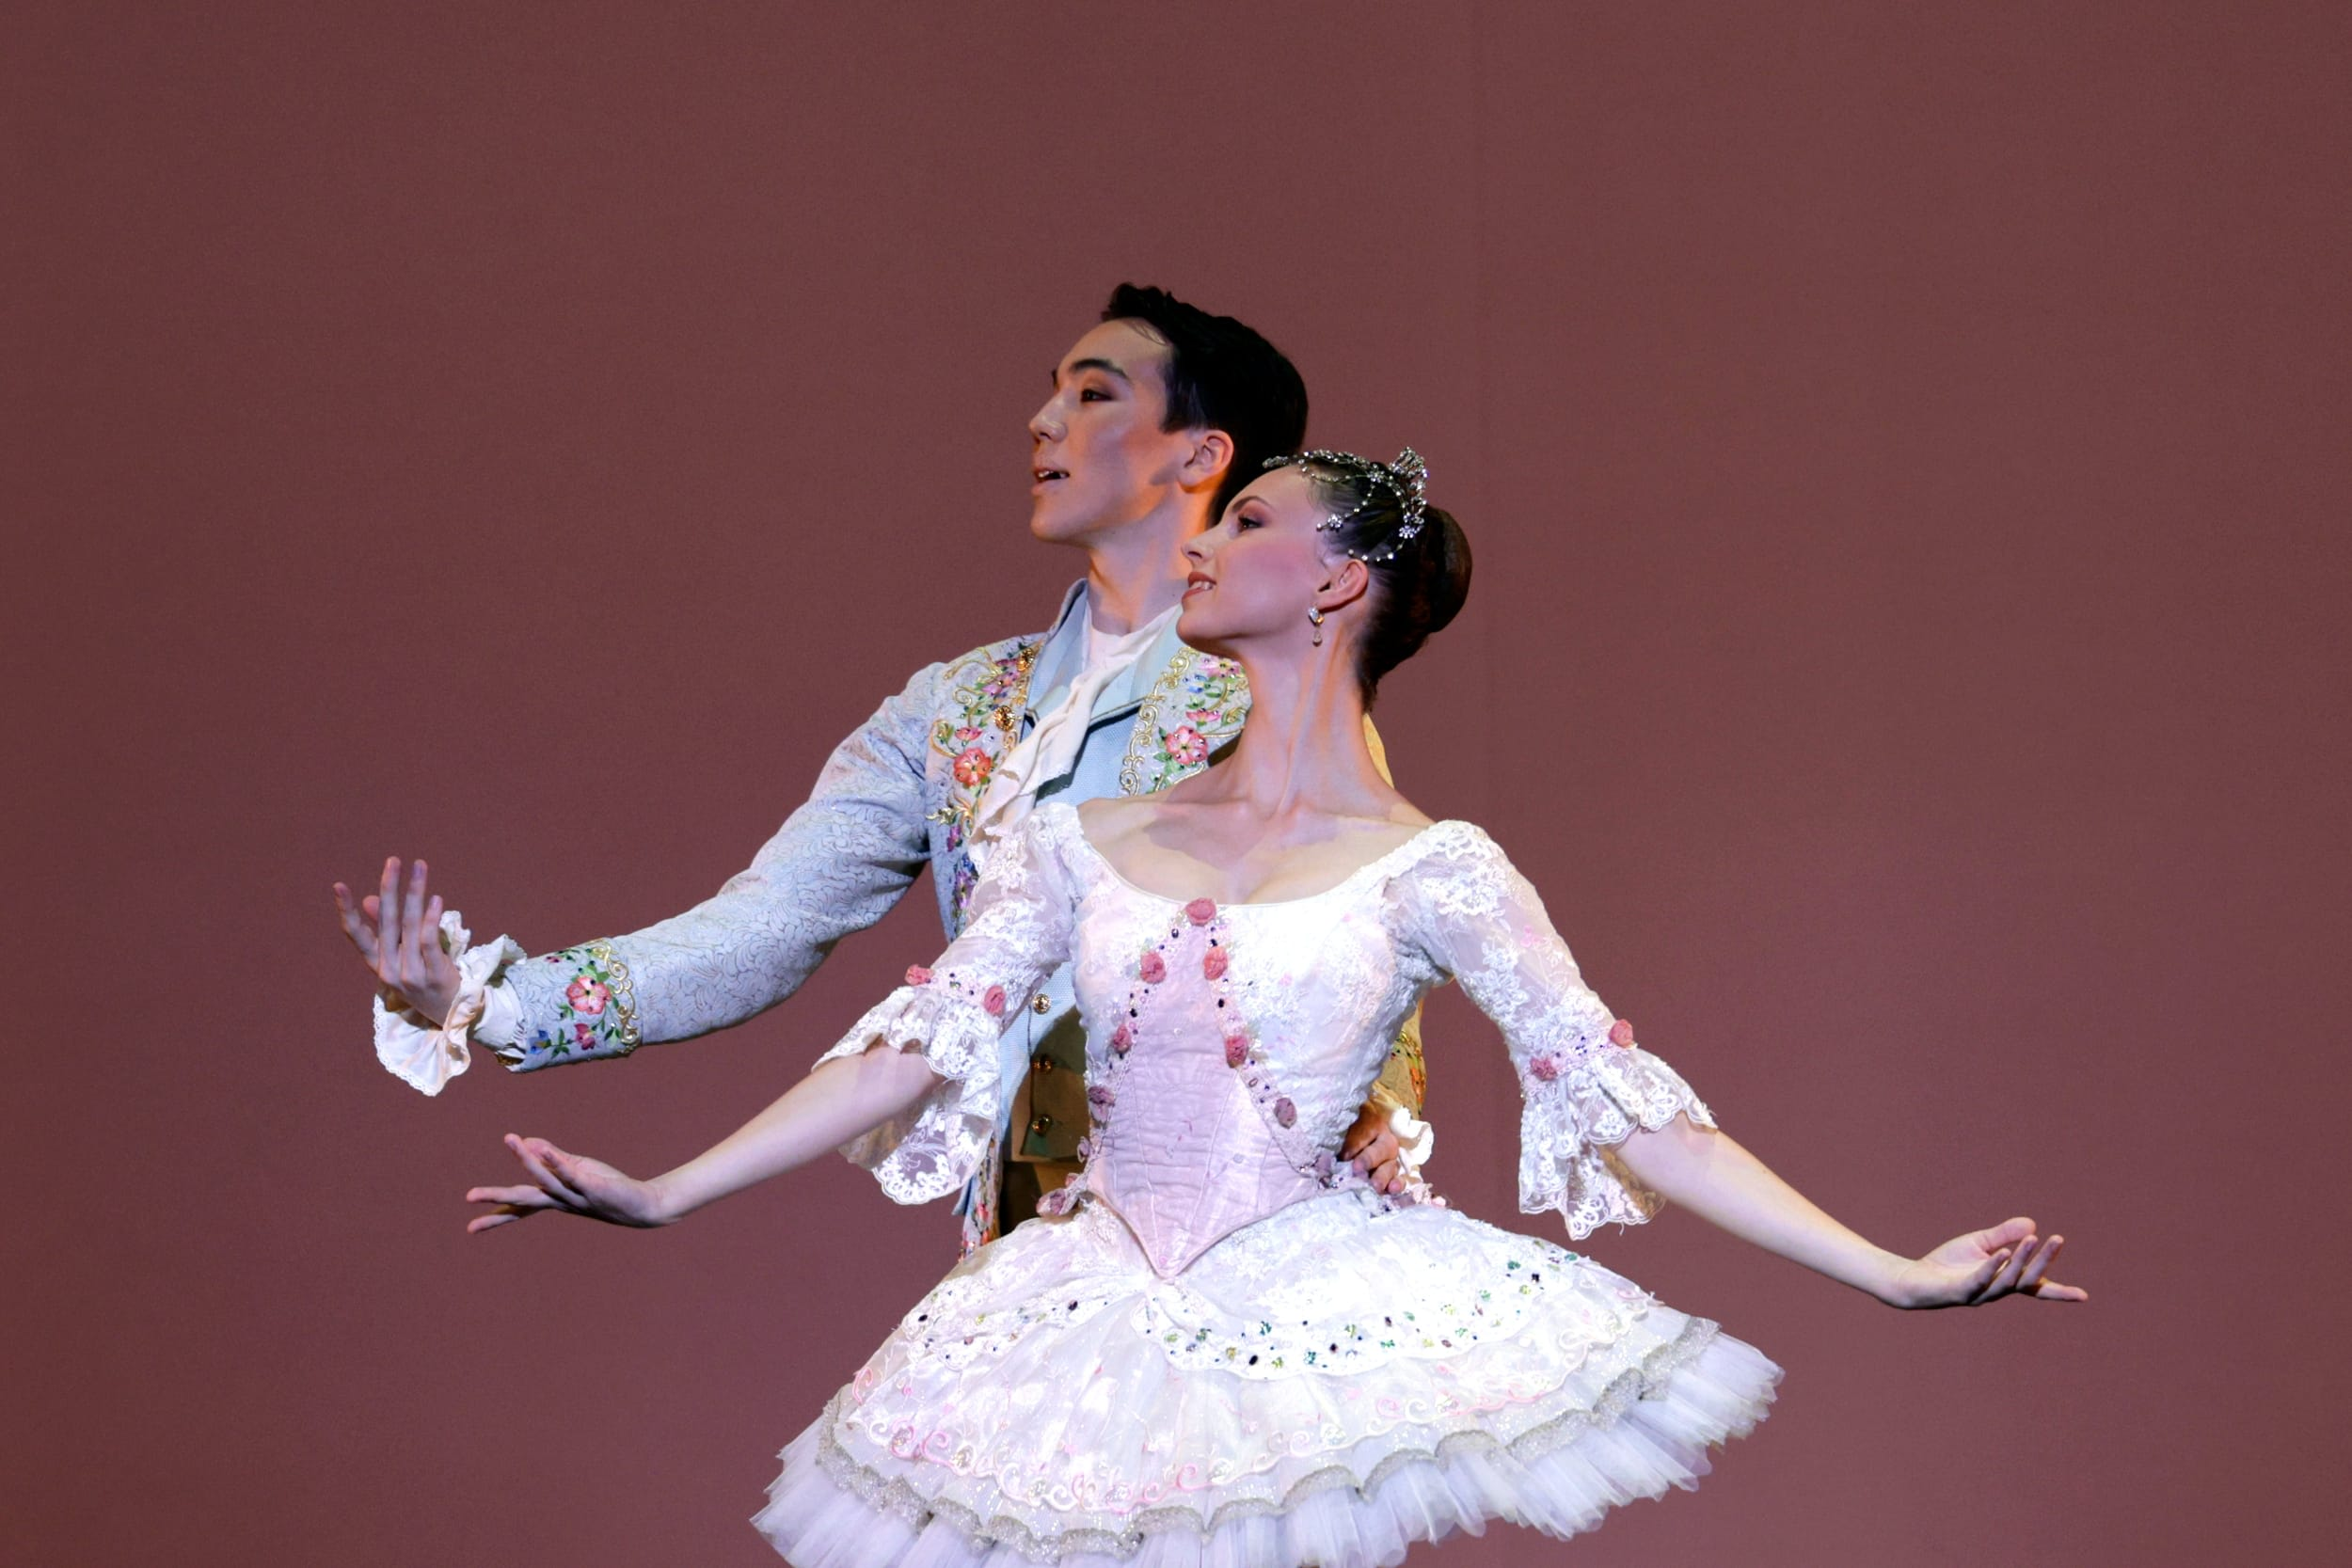 Jeunes danseurs de l'Opéra